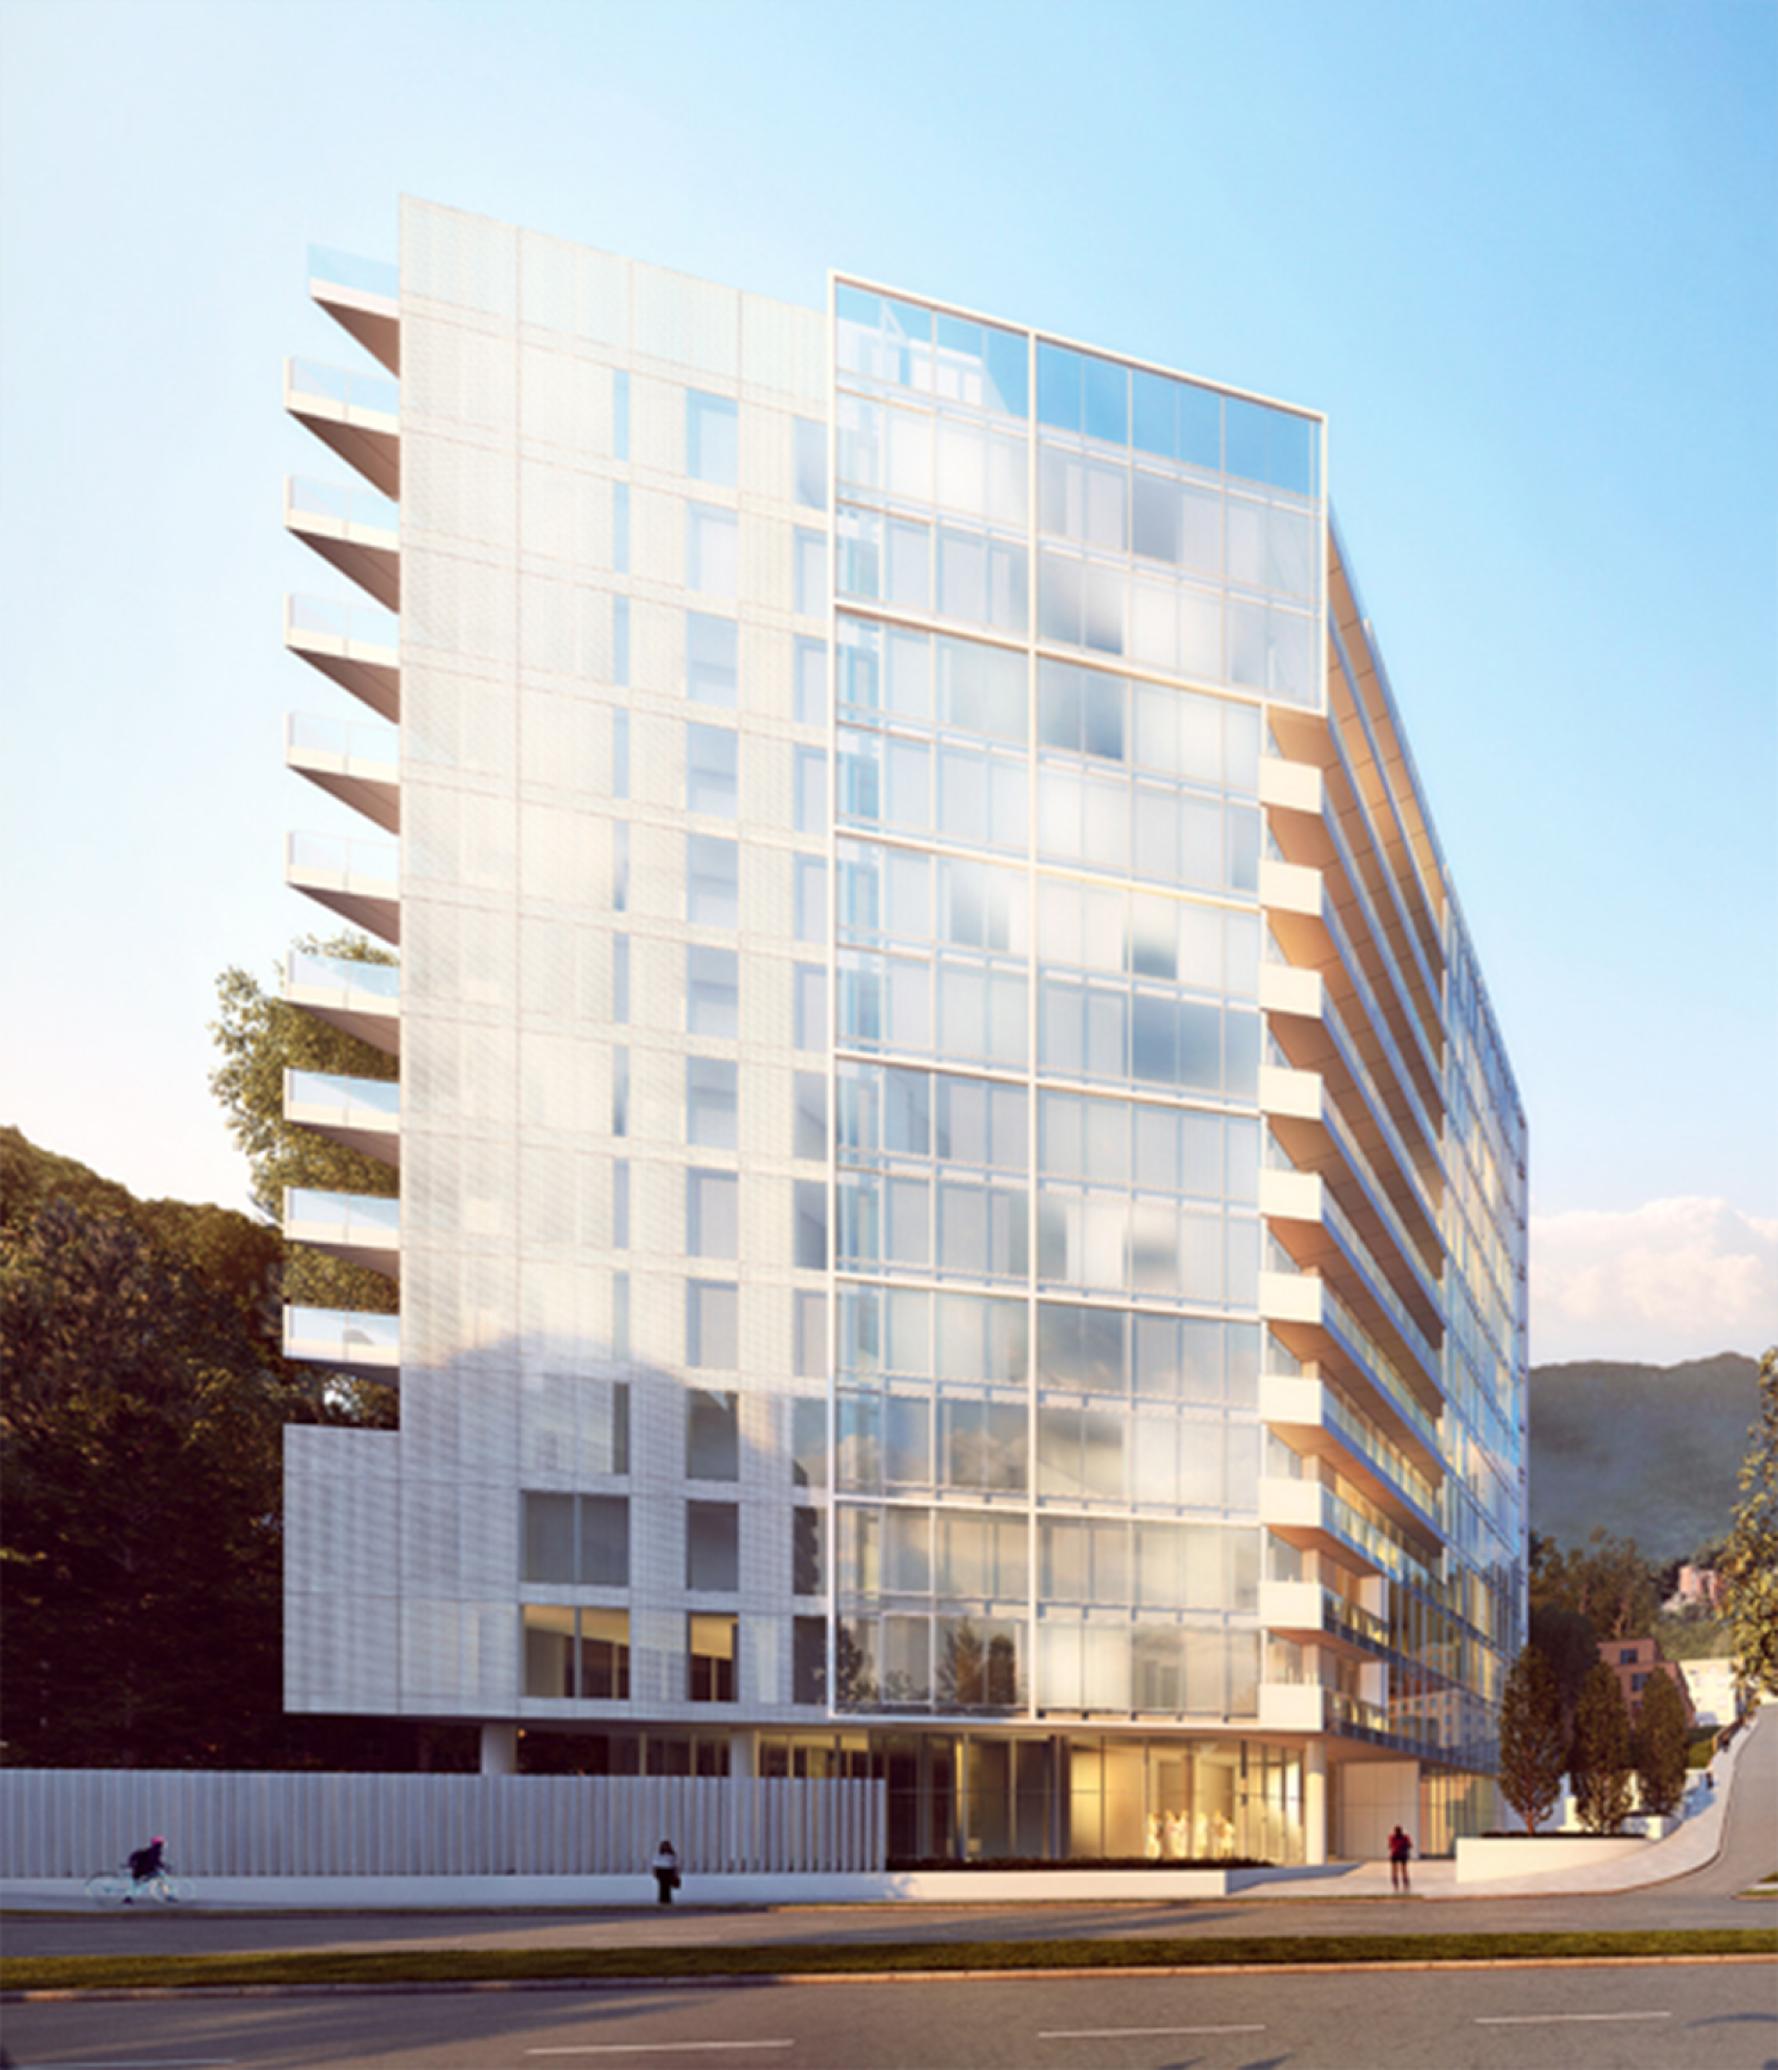 Galería - Richard Meier diseña edificio residencial en Bogotá, Colombia - 4